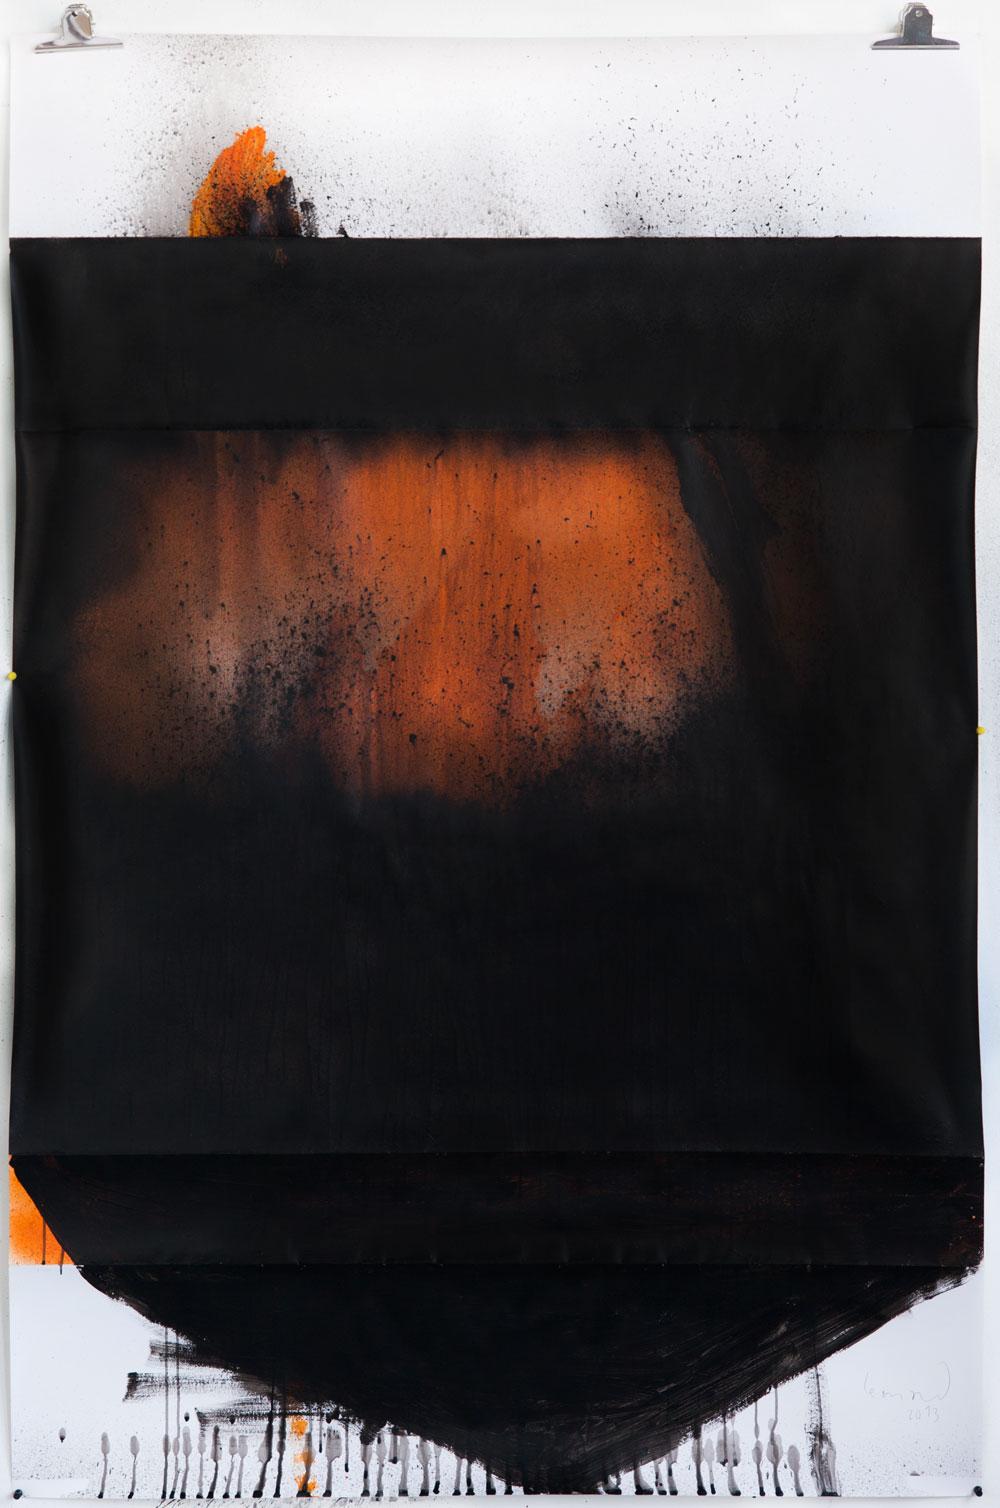 Stephane Leonard / ot / lacquer on paper / 110 x 166 cm / 2013